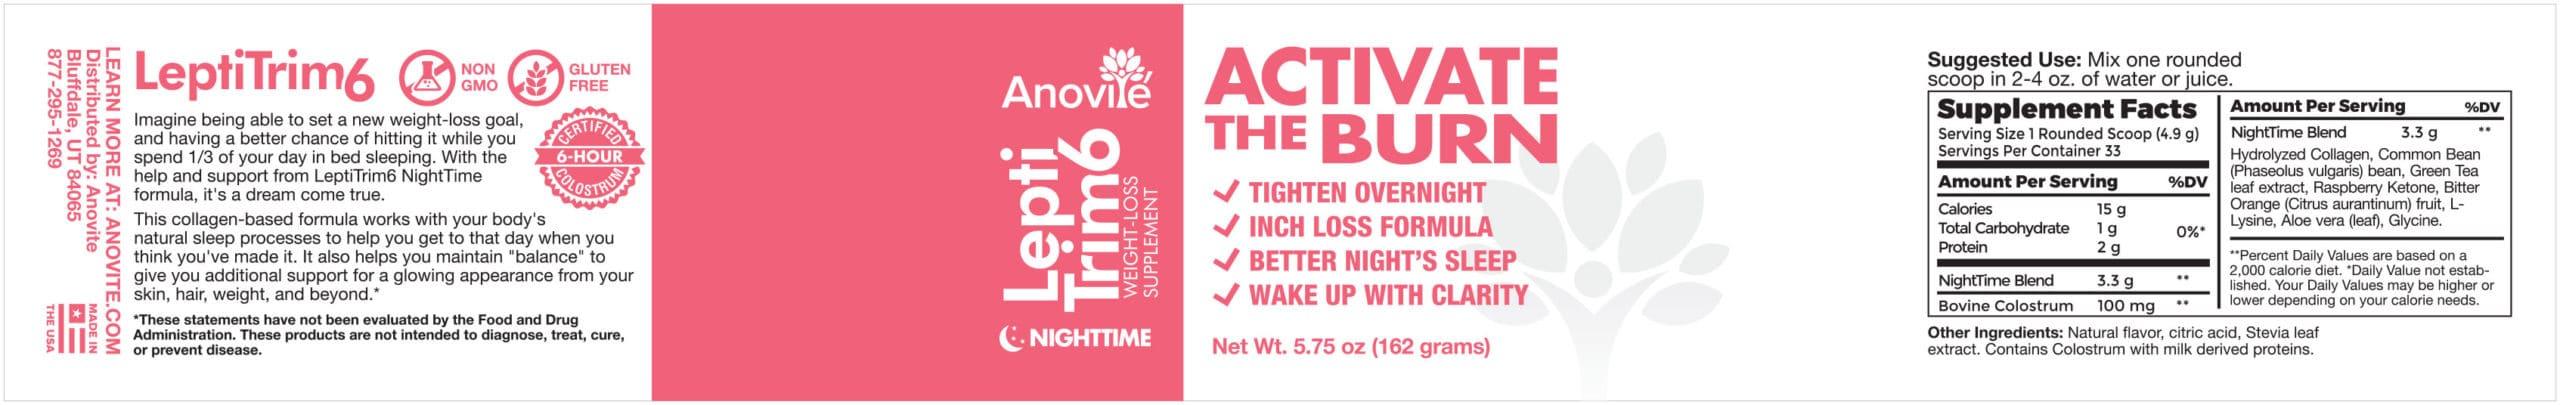 Anovite-LeptiTrim6-night-time